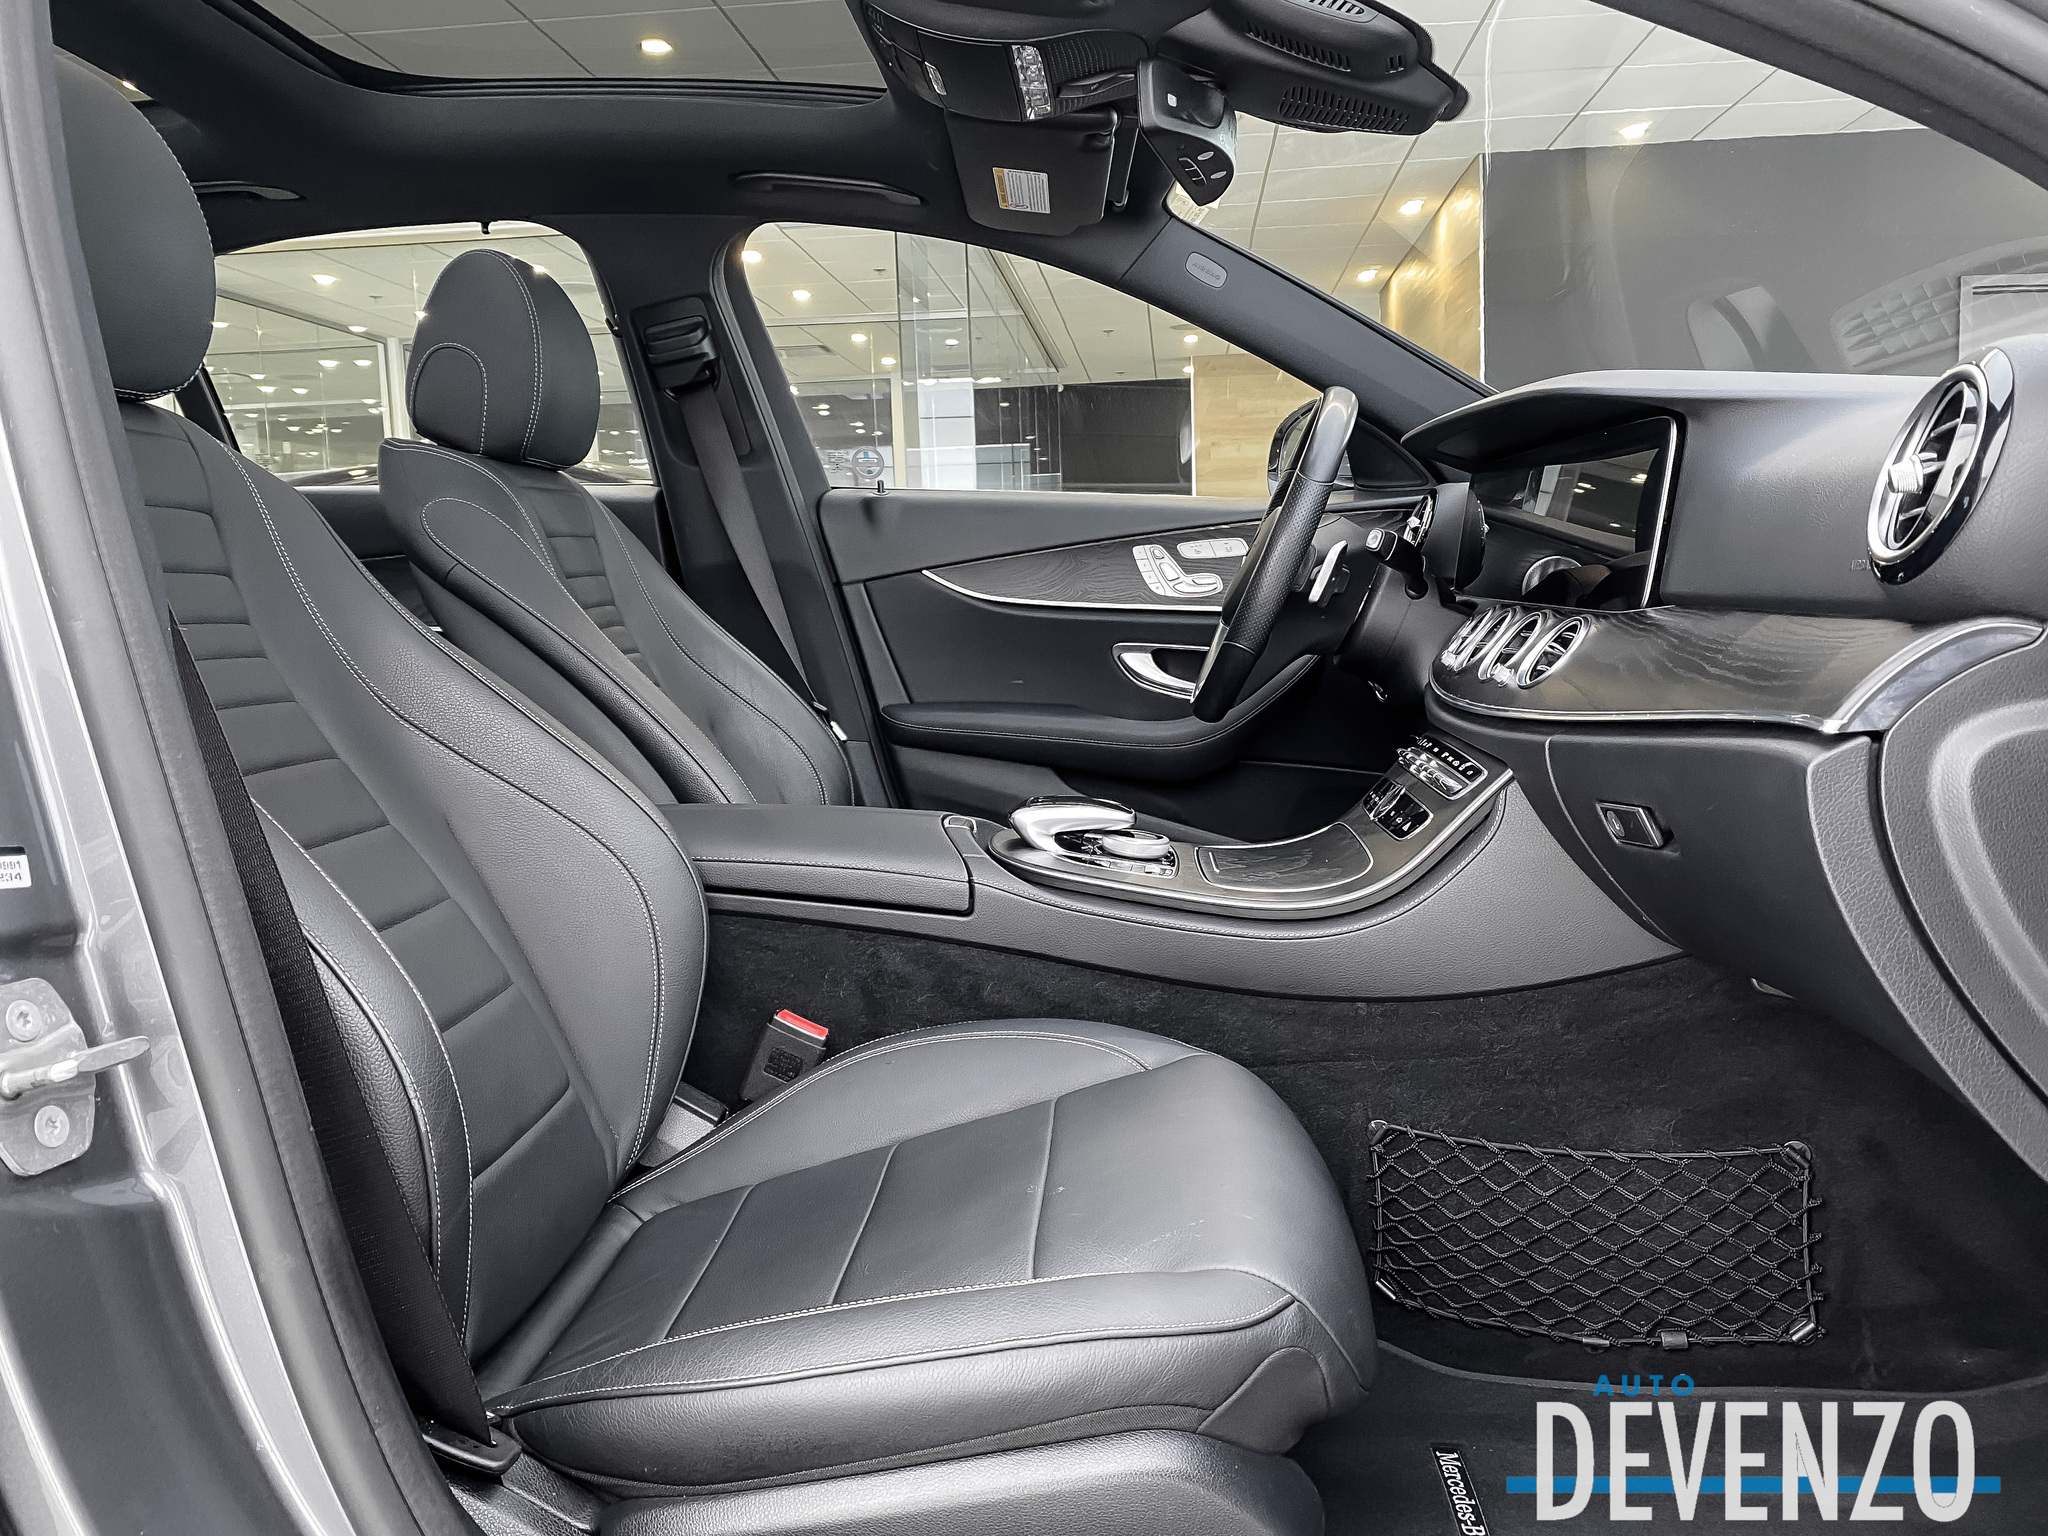 2018 Mercedes-Benz E-Class E400 4MATIC SPORT PACKAGE / INTELLIGENT DRIVE complet